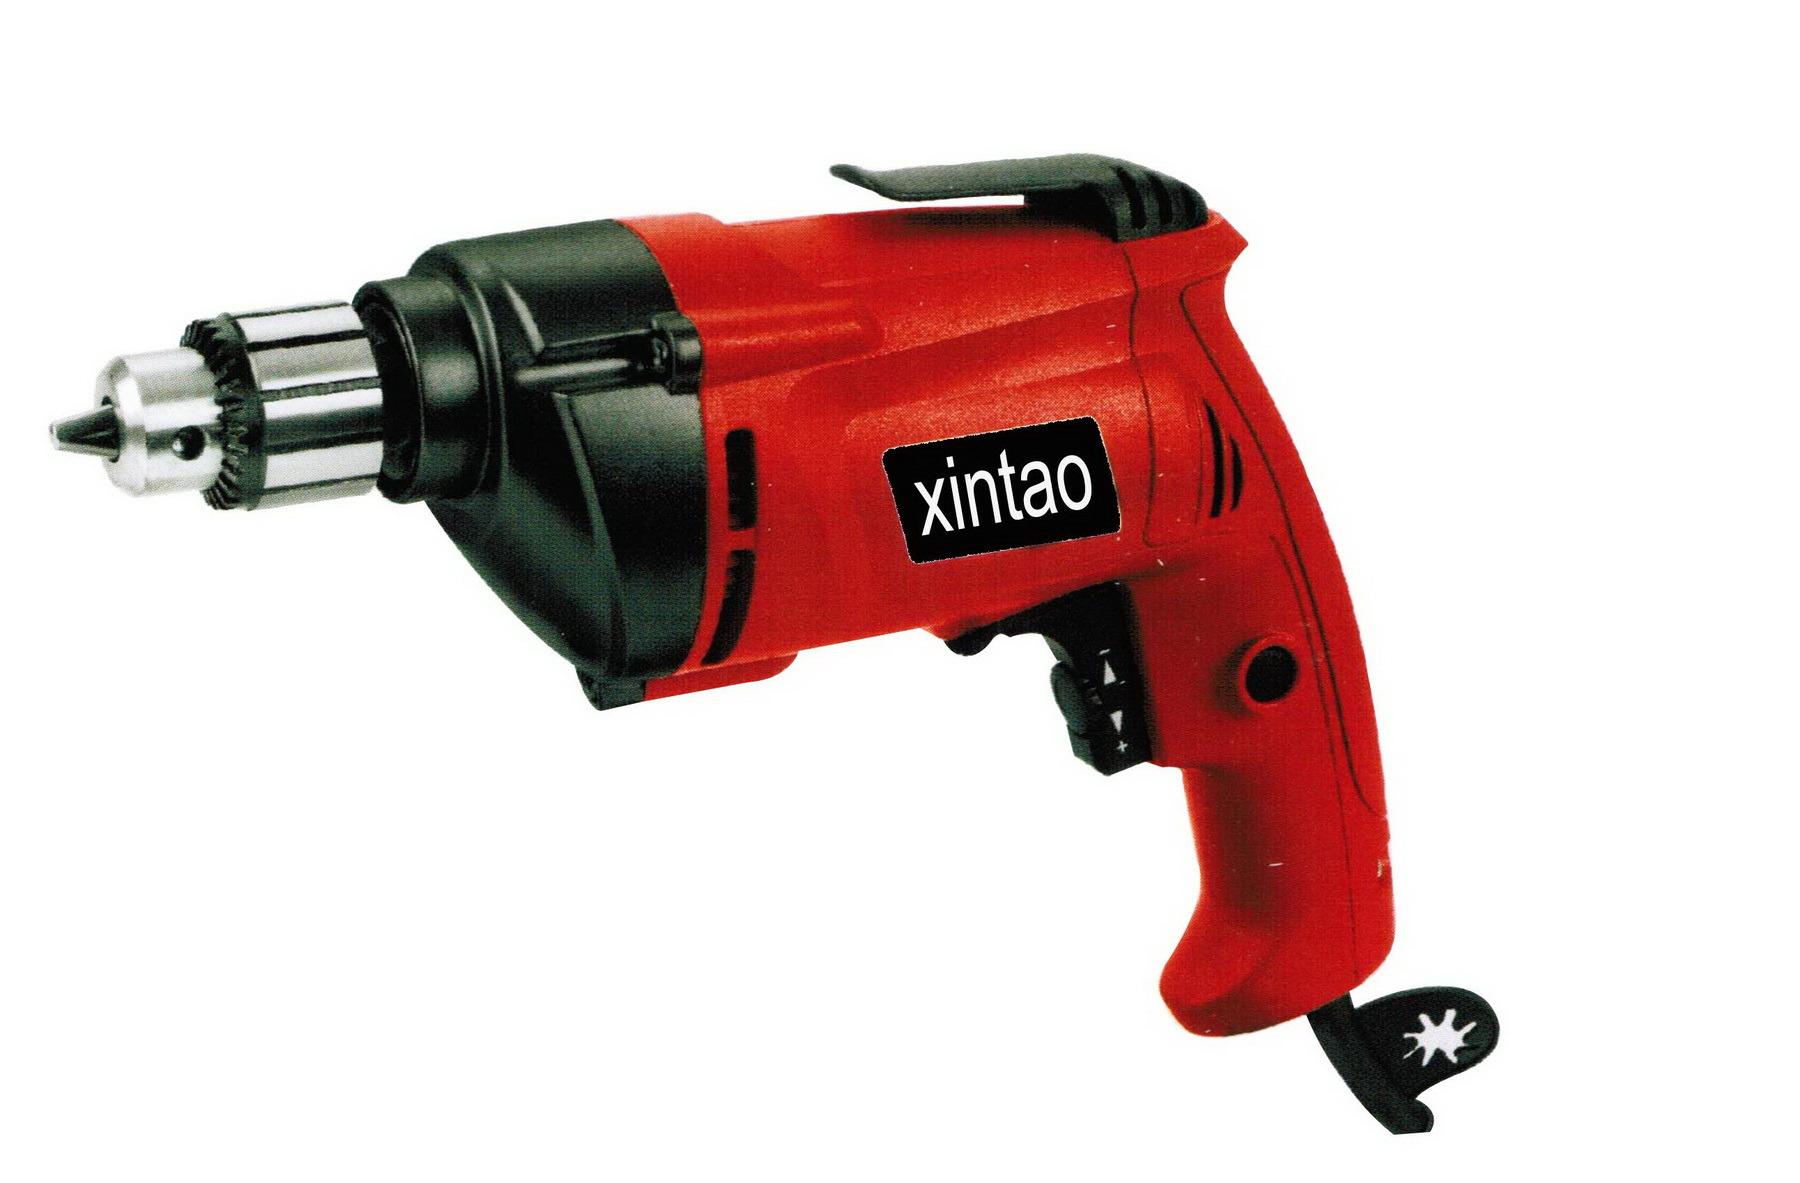 "Mini Drill Chuck 1/4"" Hex Shank For Micro Drill Bits"